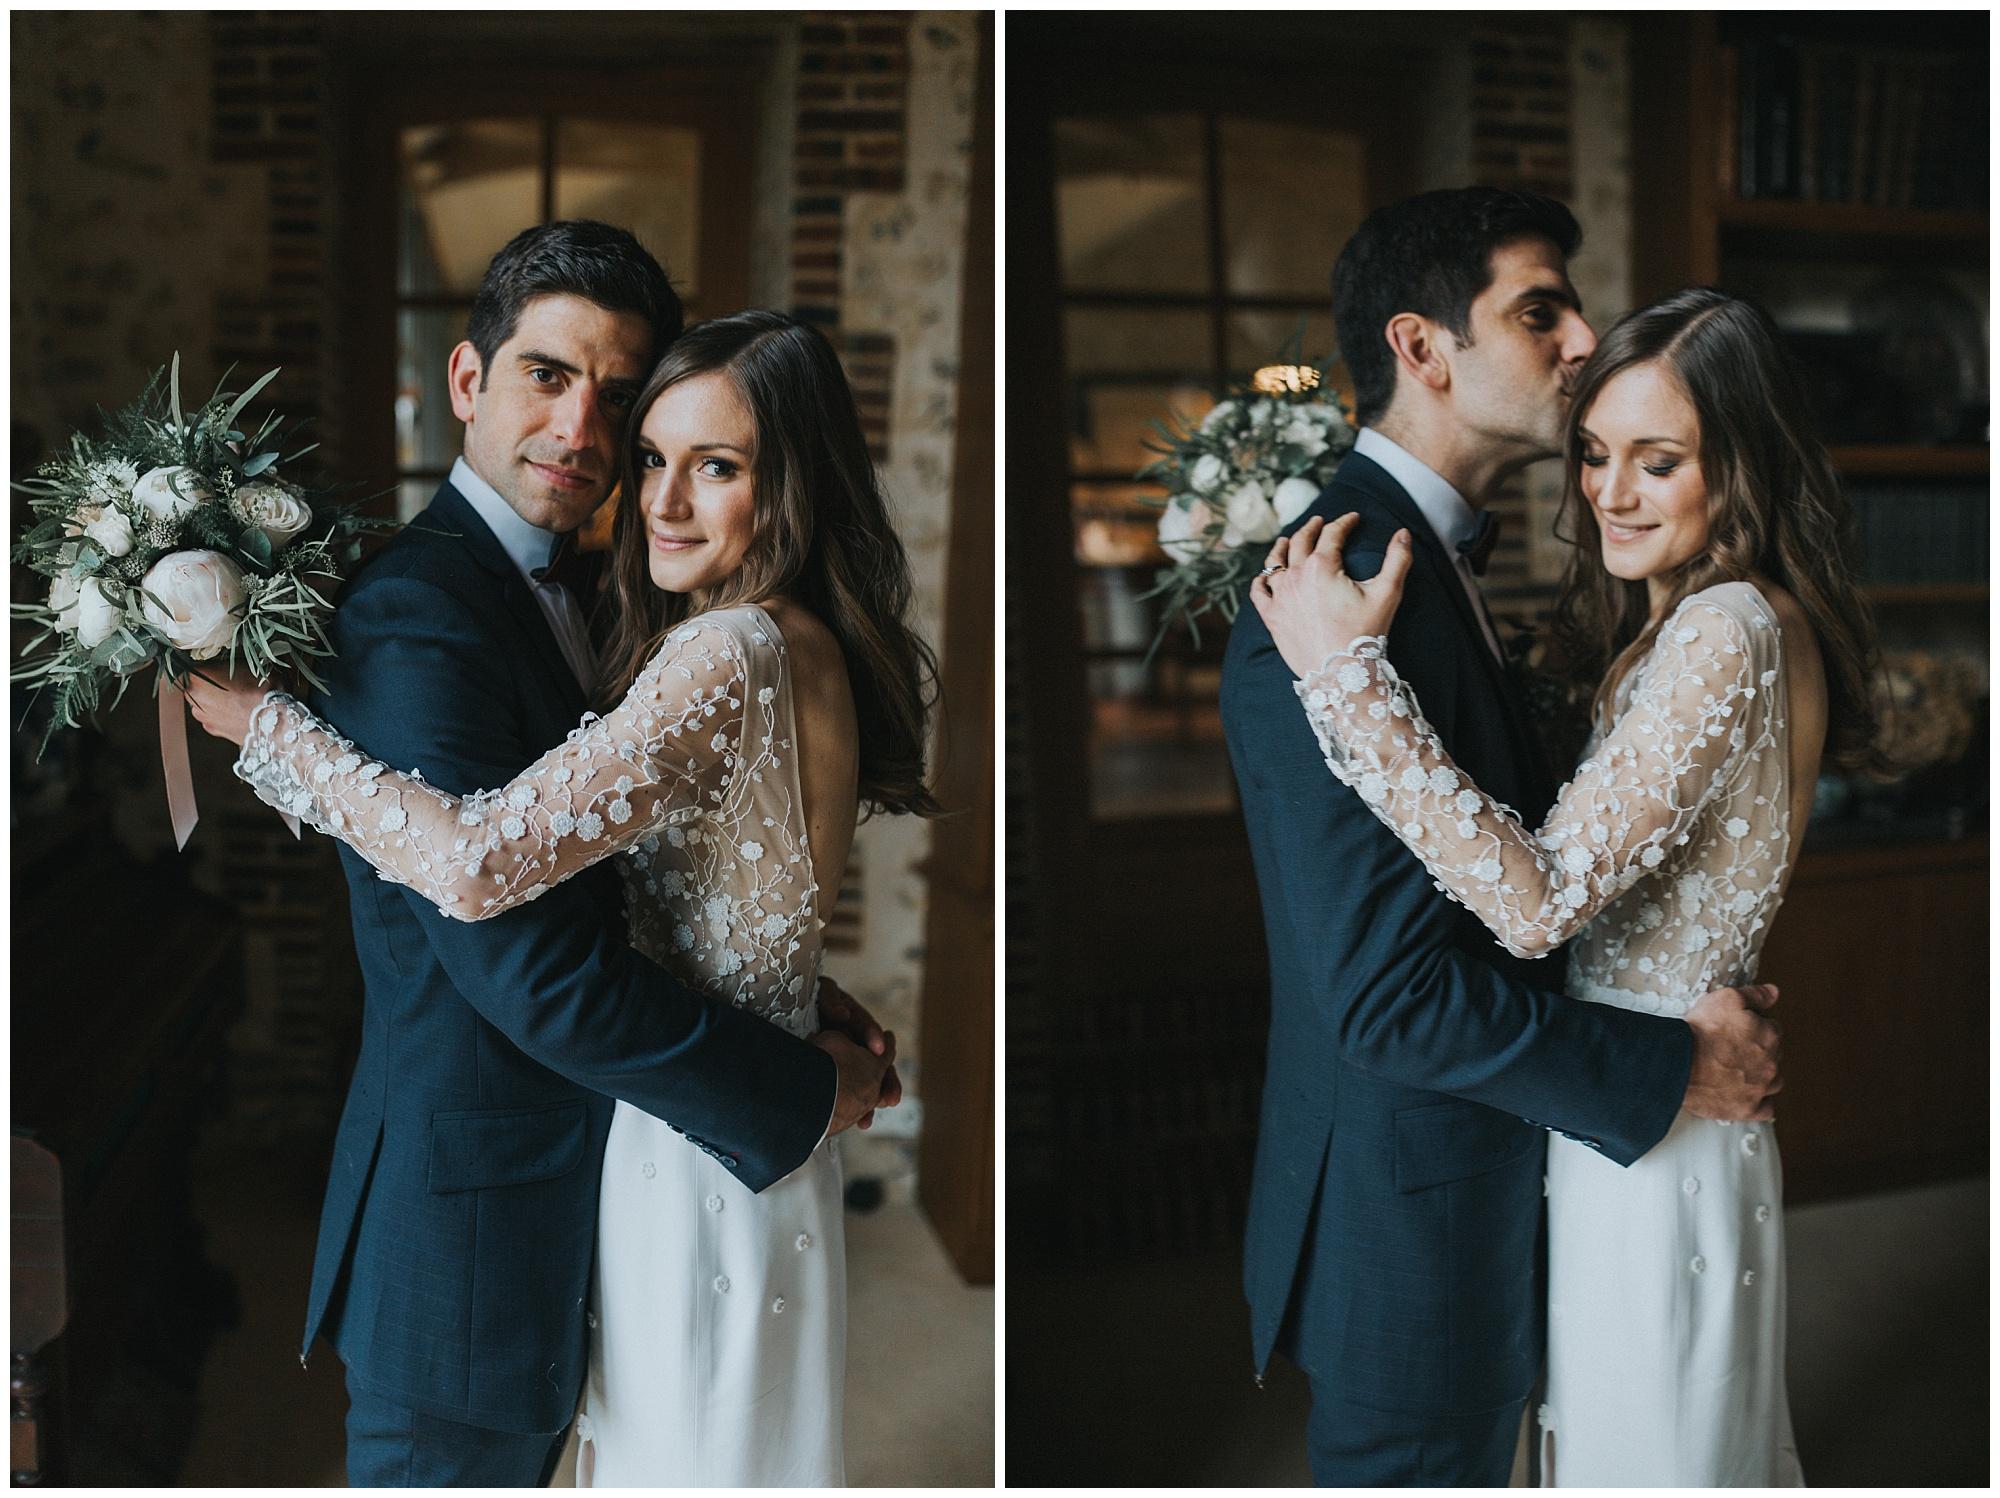 Kateryna-photos-photographer-rouen-domaine-des-evis-mariage-normandie-photos-de-couple-